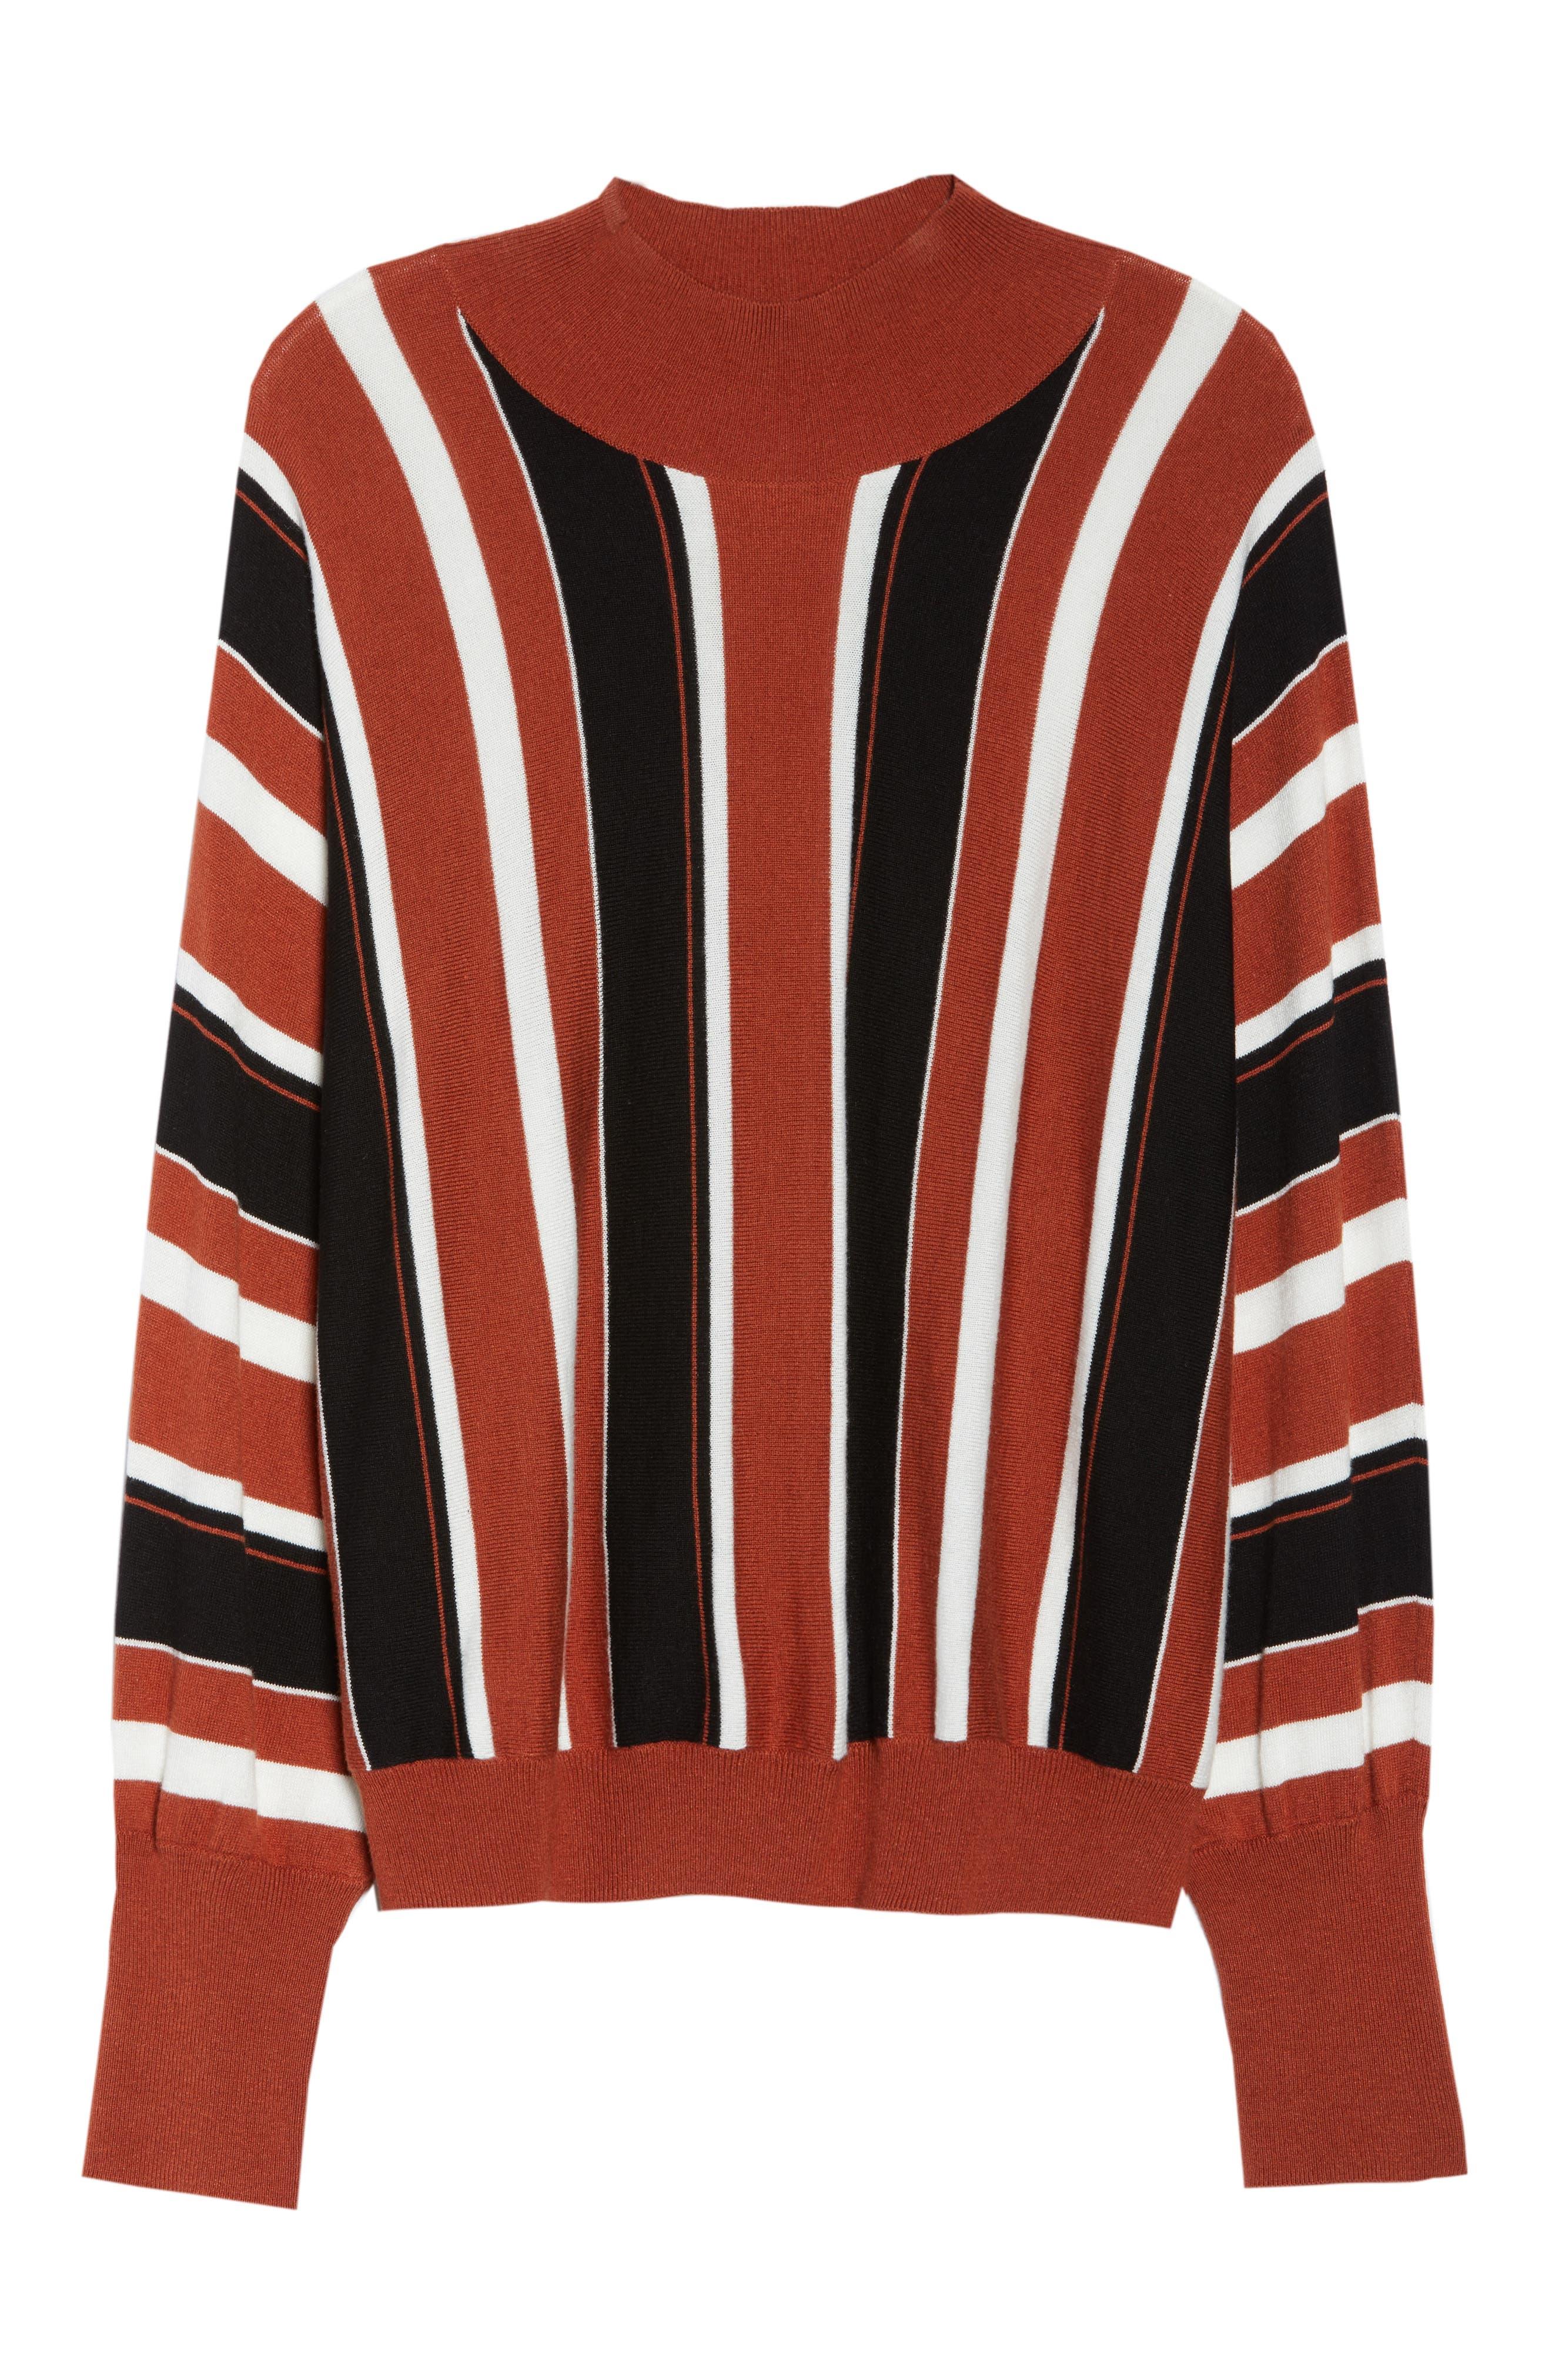 Stripe Dolman Sleeve Sweater,                             Alternate thumbnail 11, color,                             210